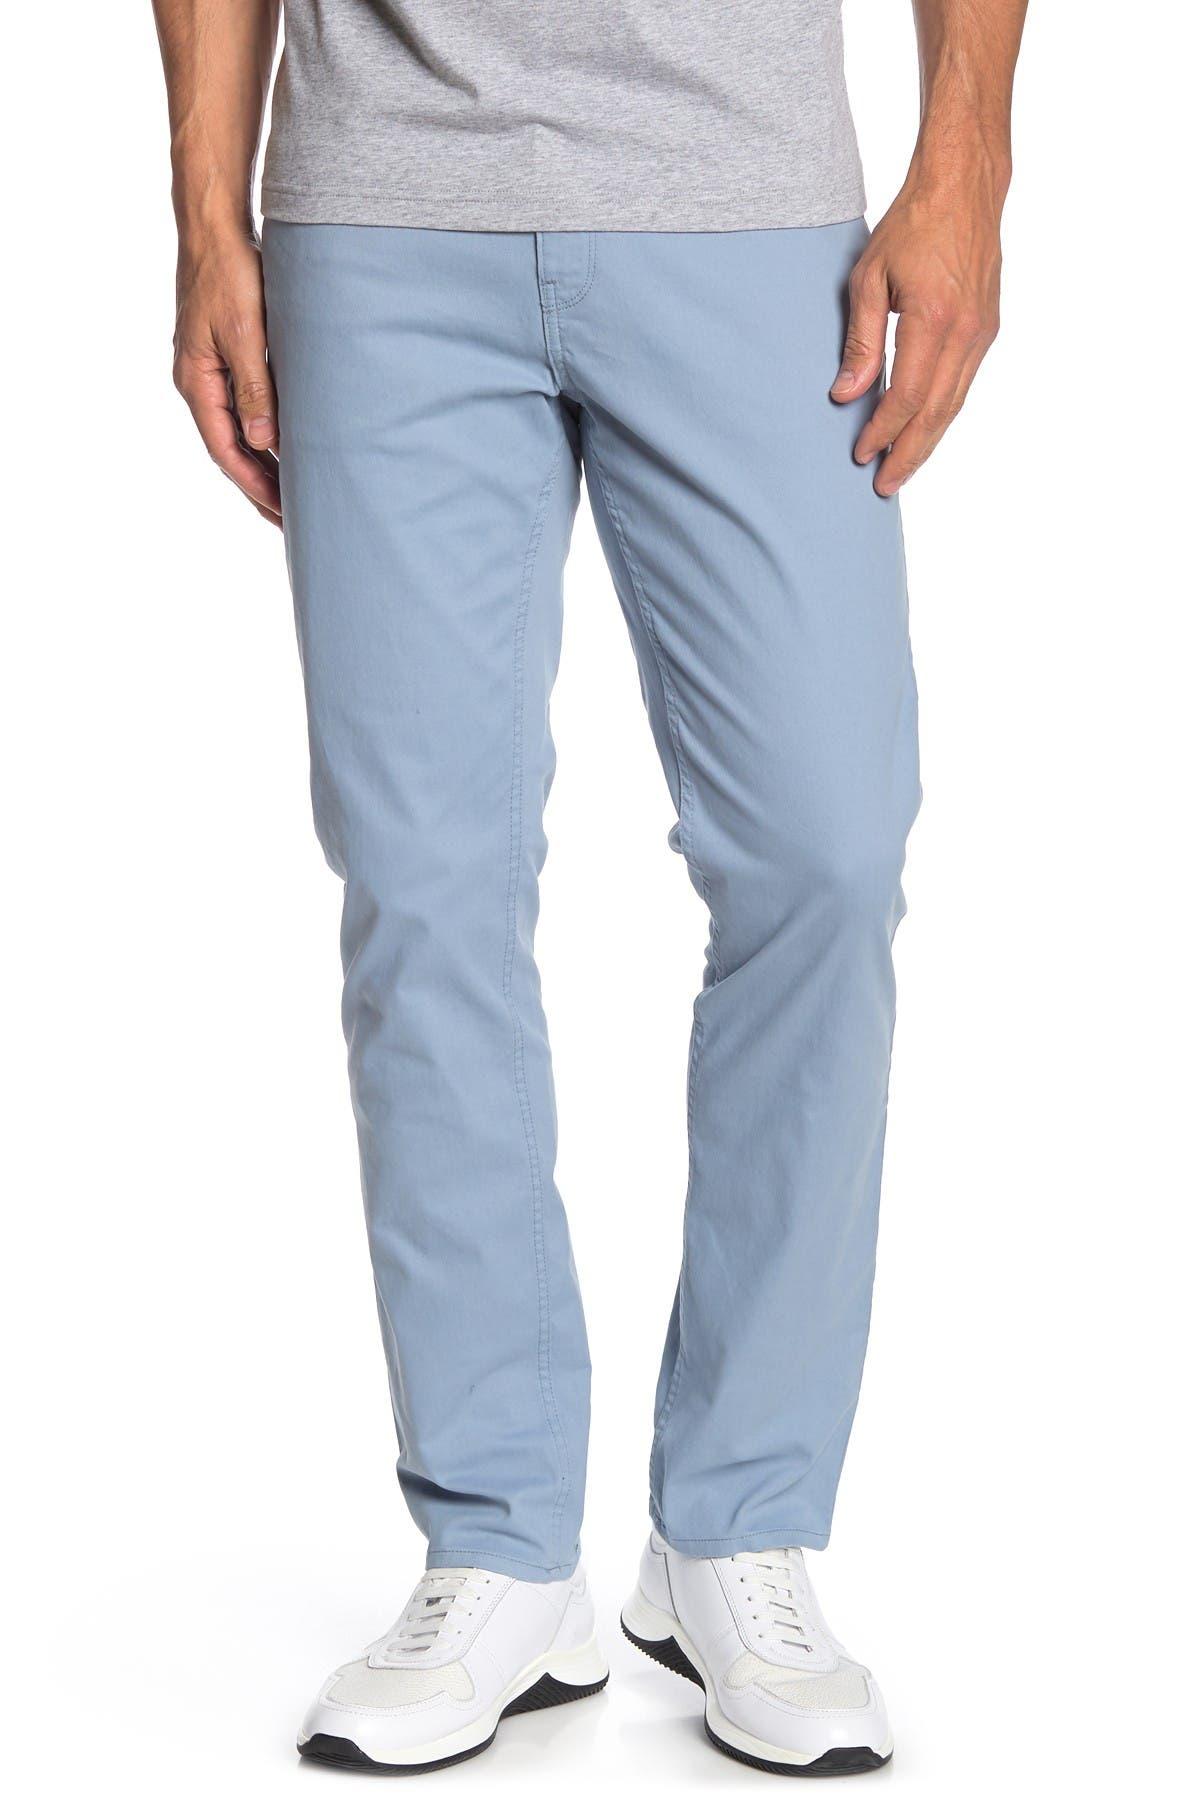 "Image of Michael Kors Parker Slim Stretch Twill Pants - 30-34"" Inseam"